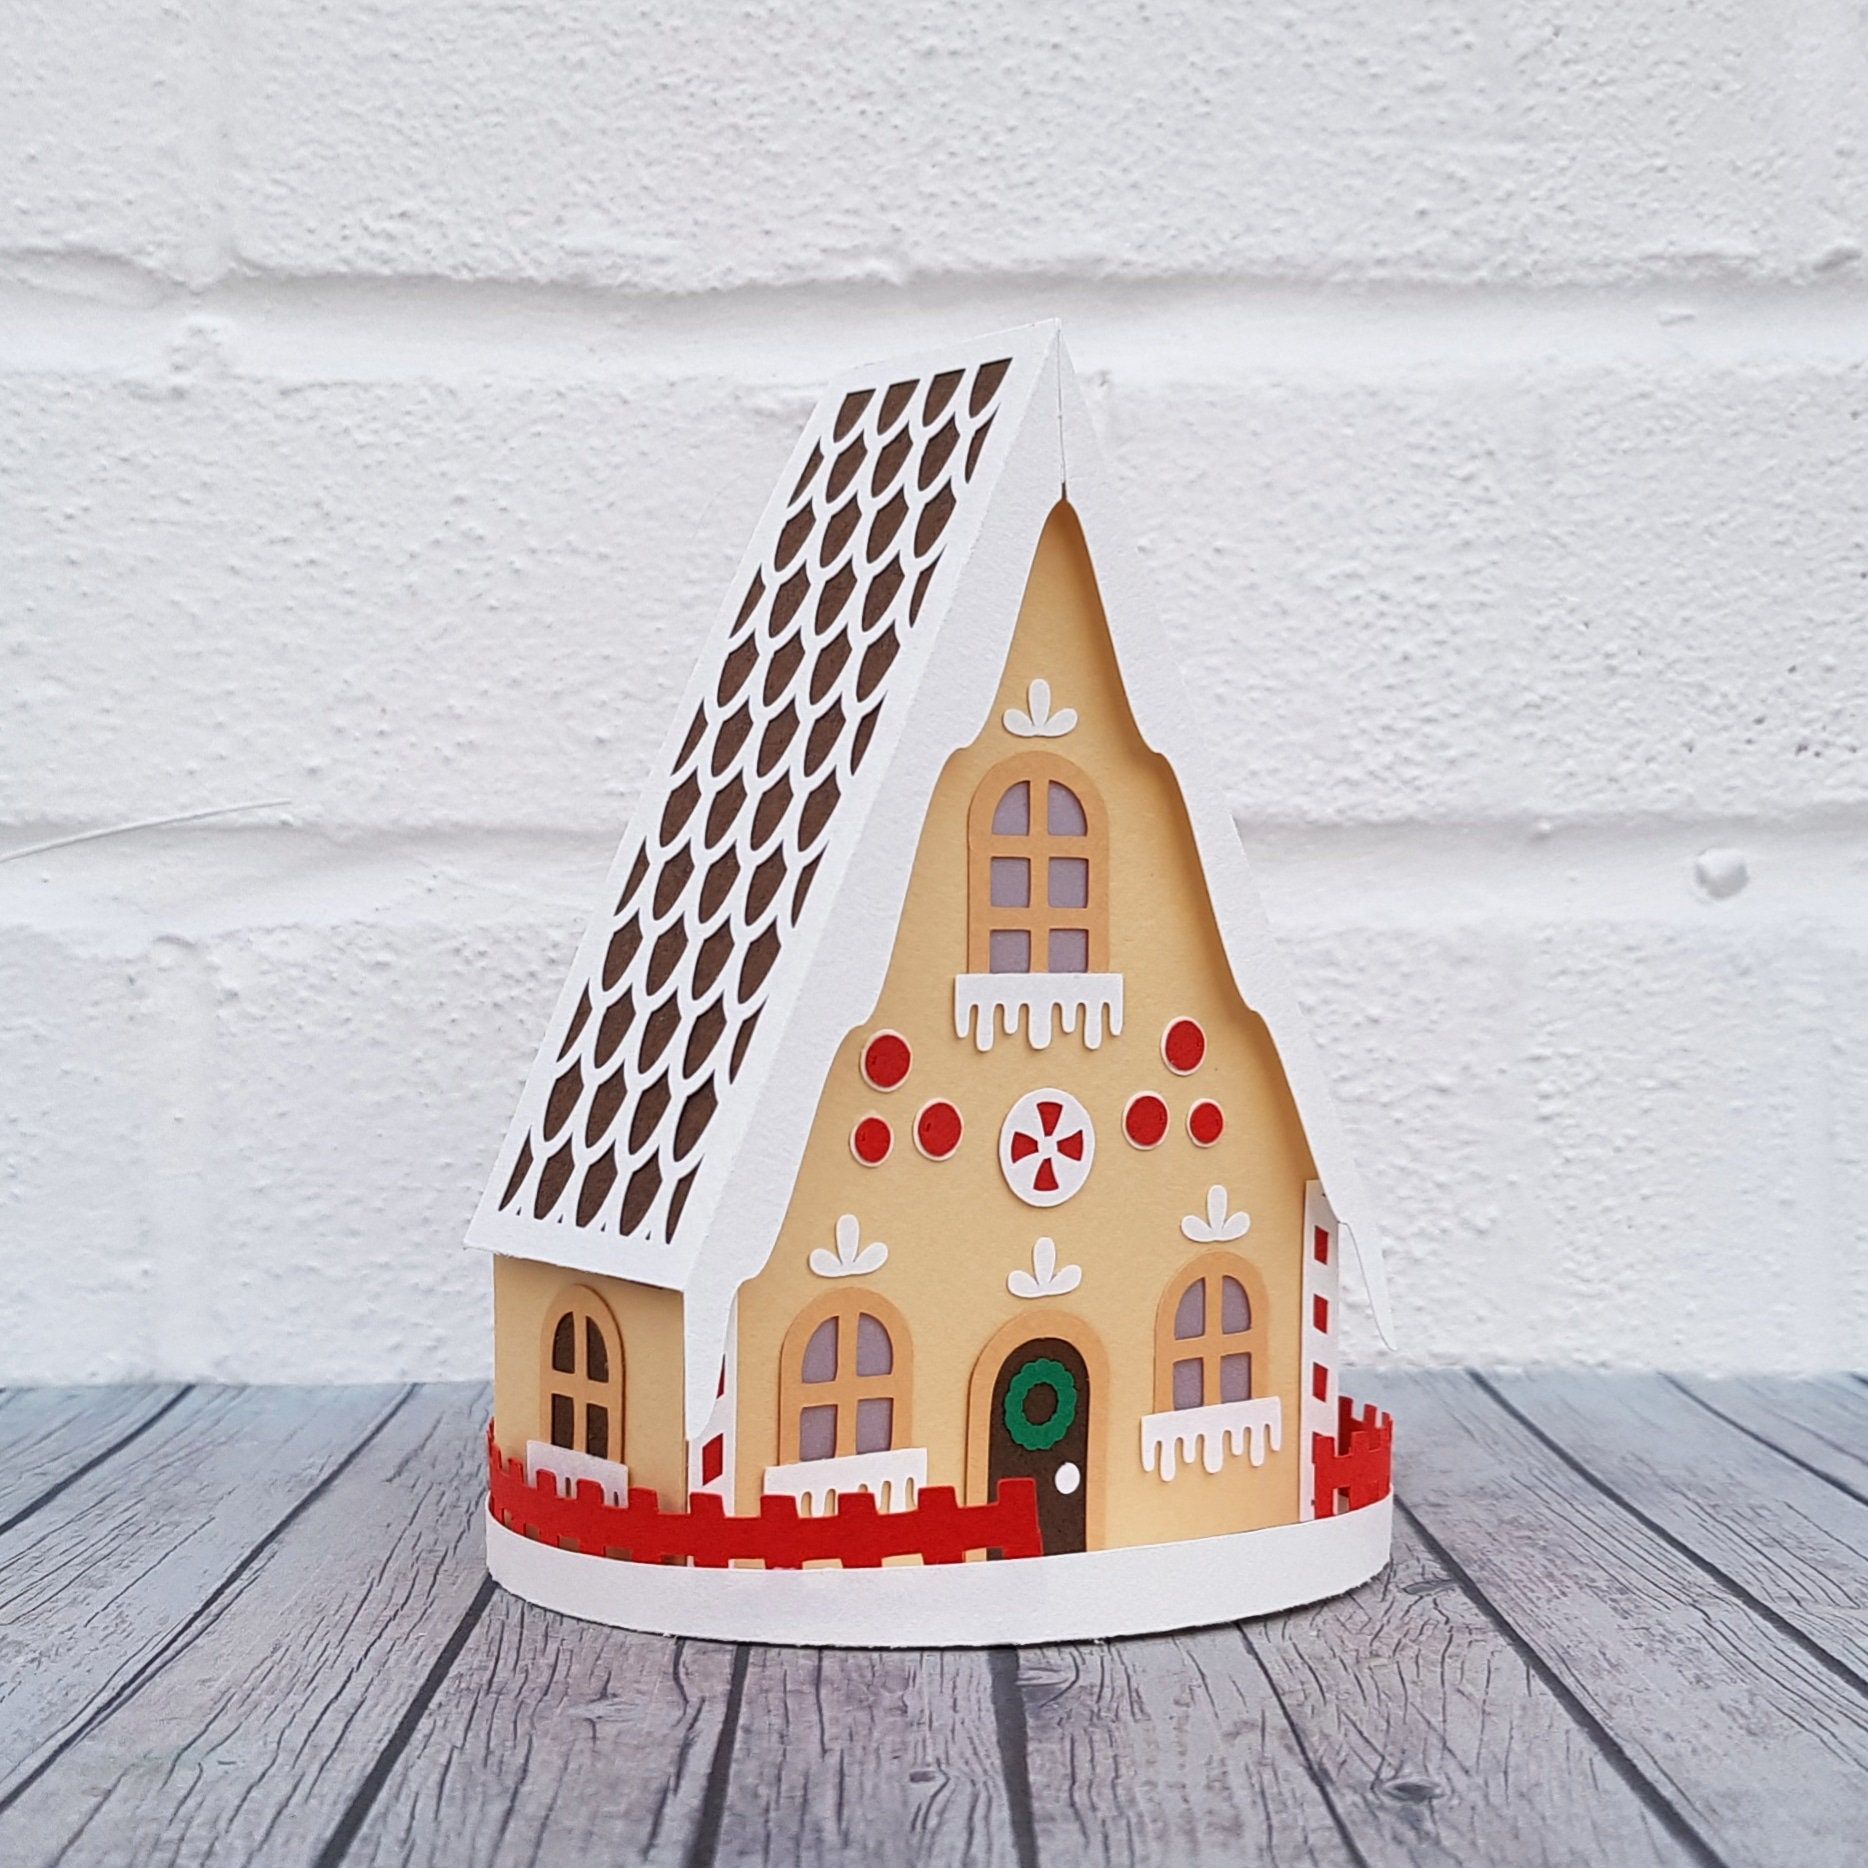 3D Gingerbread House DIY Papercutting Template Paper Craft